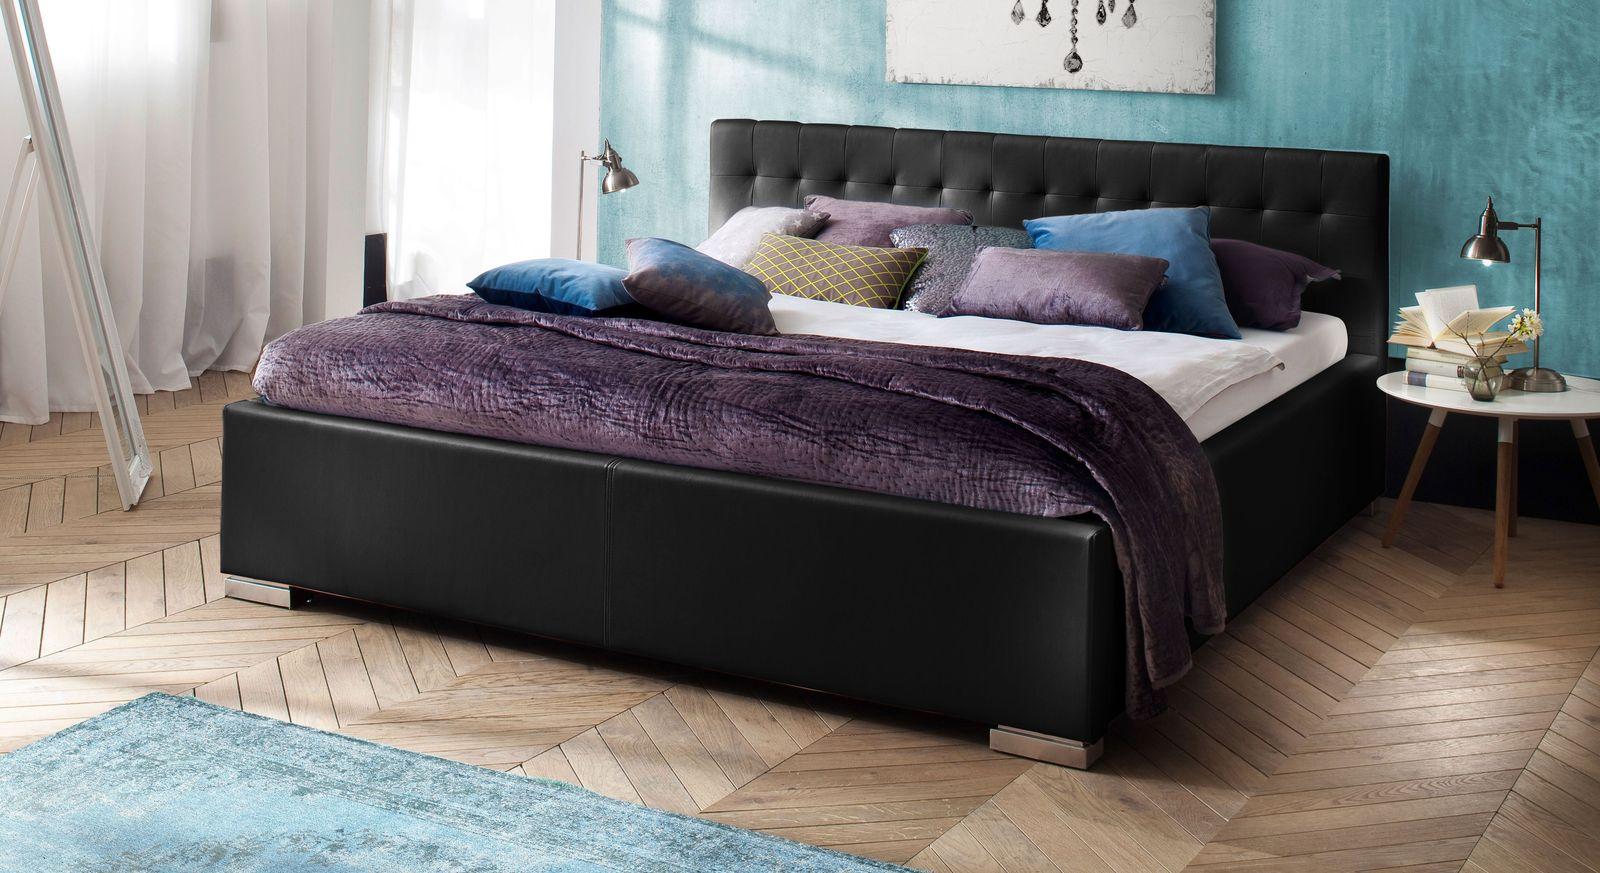 Bett Molare aus schwarzem Kunstleder